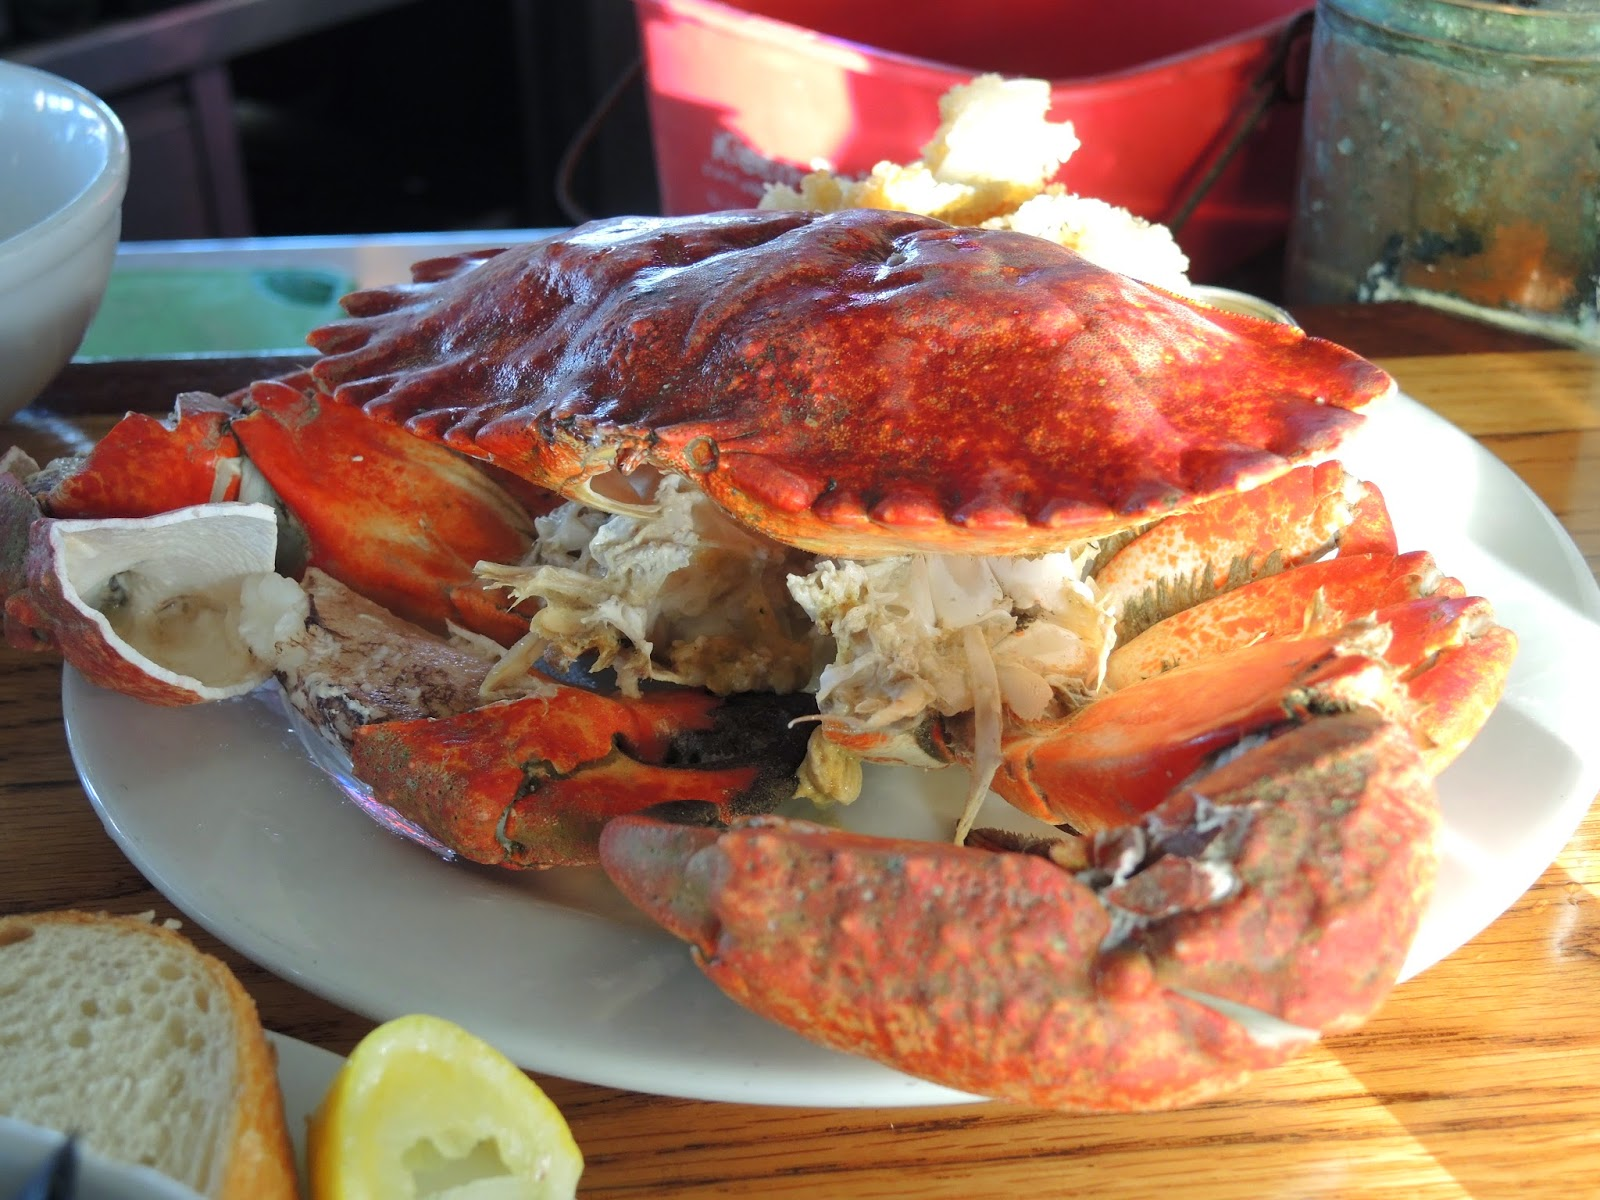 2014 Spring break 美國西岸自駕遊食記 Part 3 — 蒙特利、丹麥村、聖塔芭芭拉